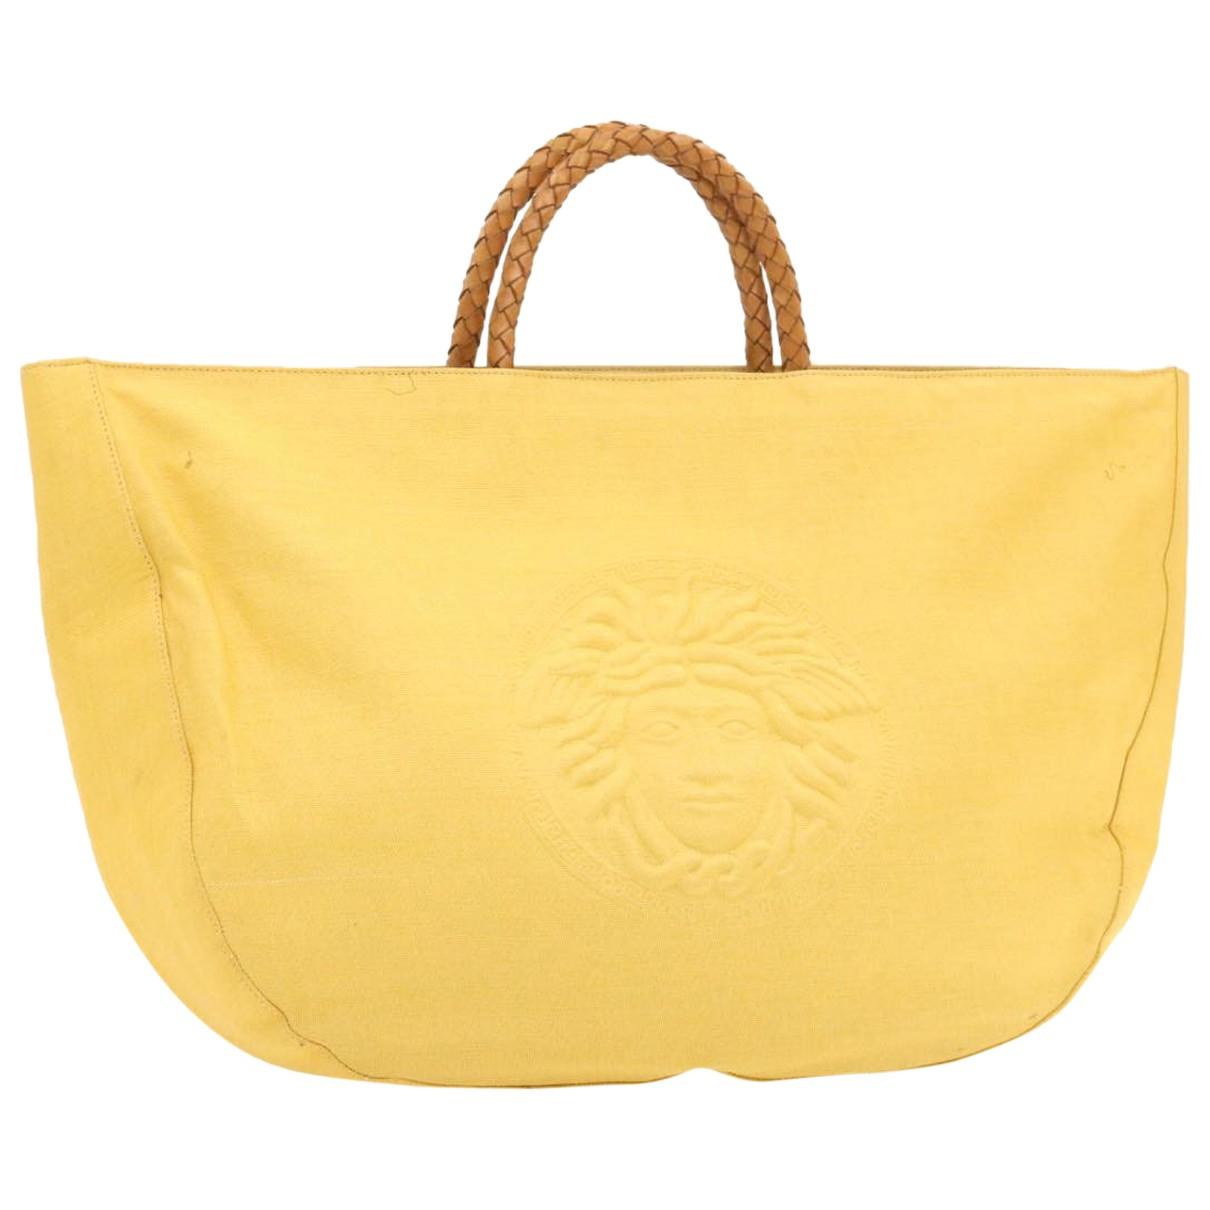 Gianni Versace N Yellow Cloth handbag for Women N